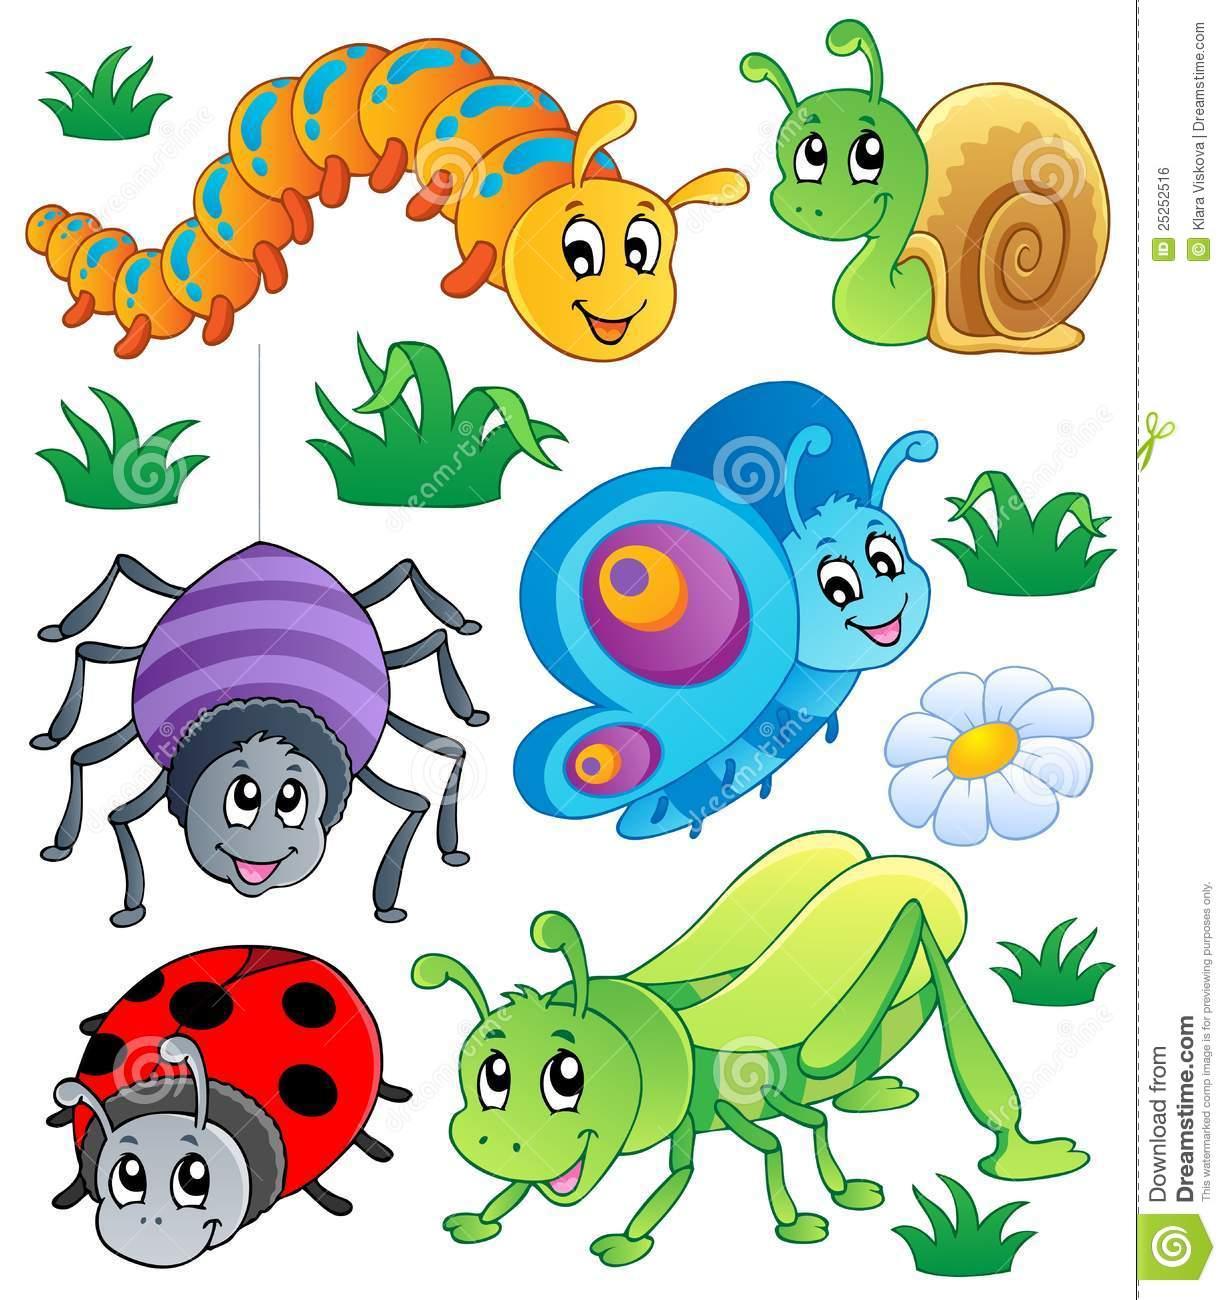 Adorable clipart bug  Insekte vir clipart Google